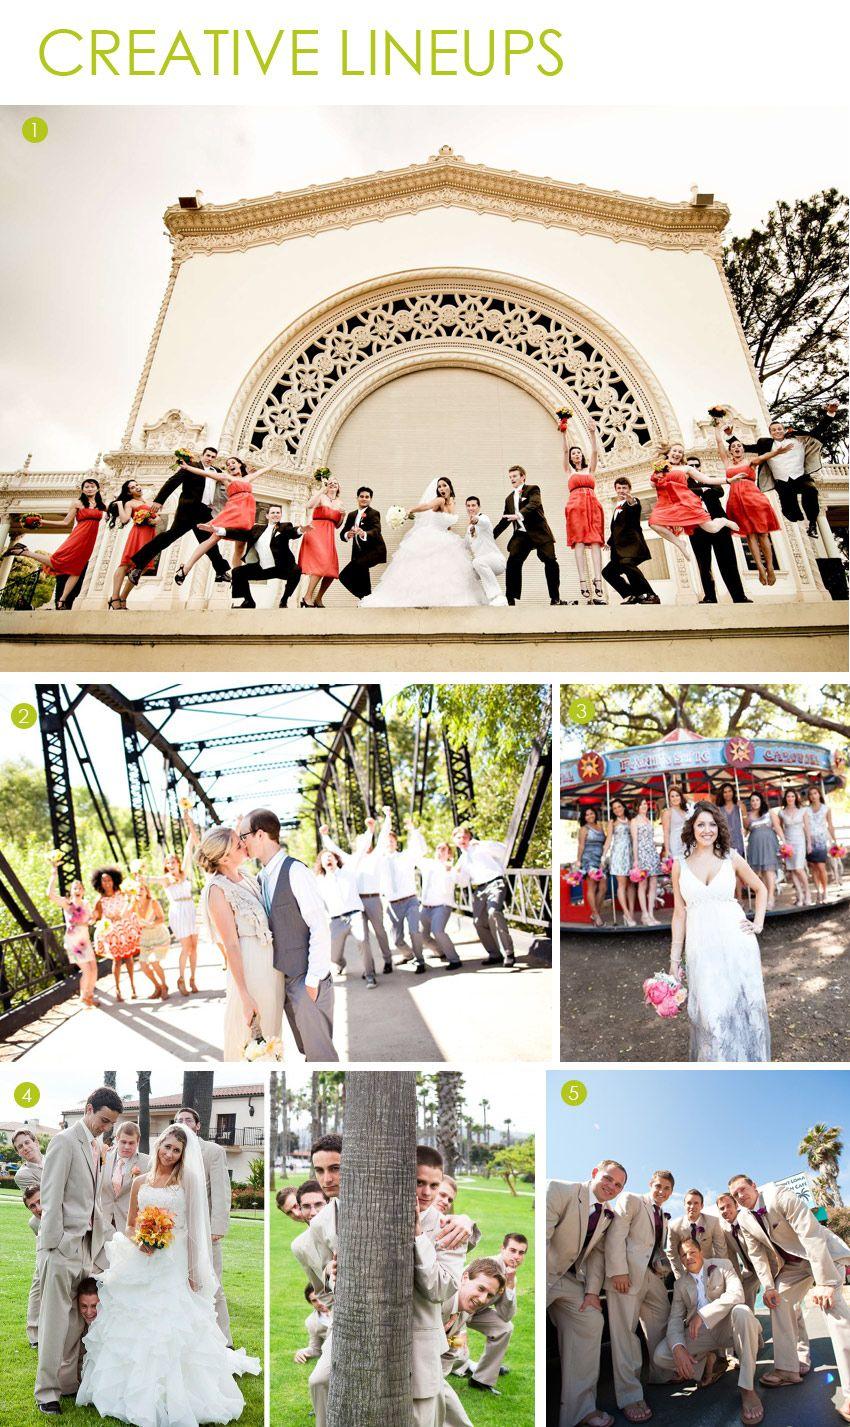 Finishing Touches Creative Wedding Party Photos